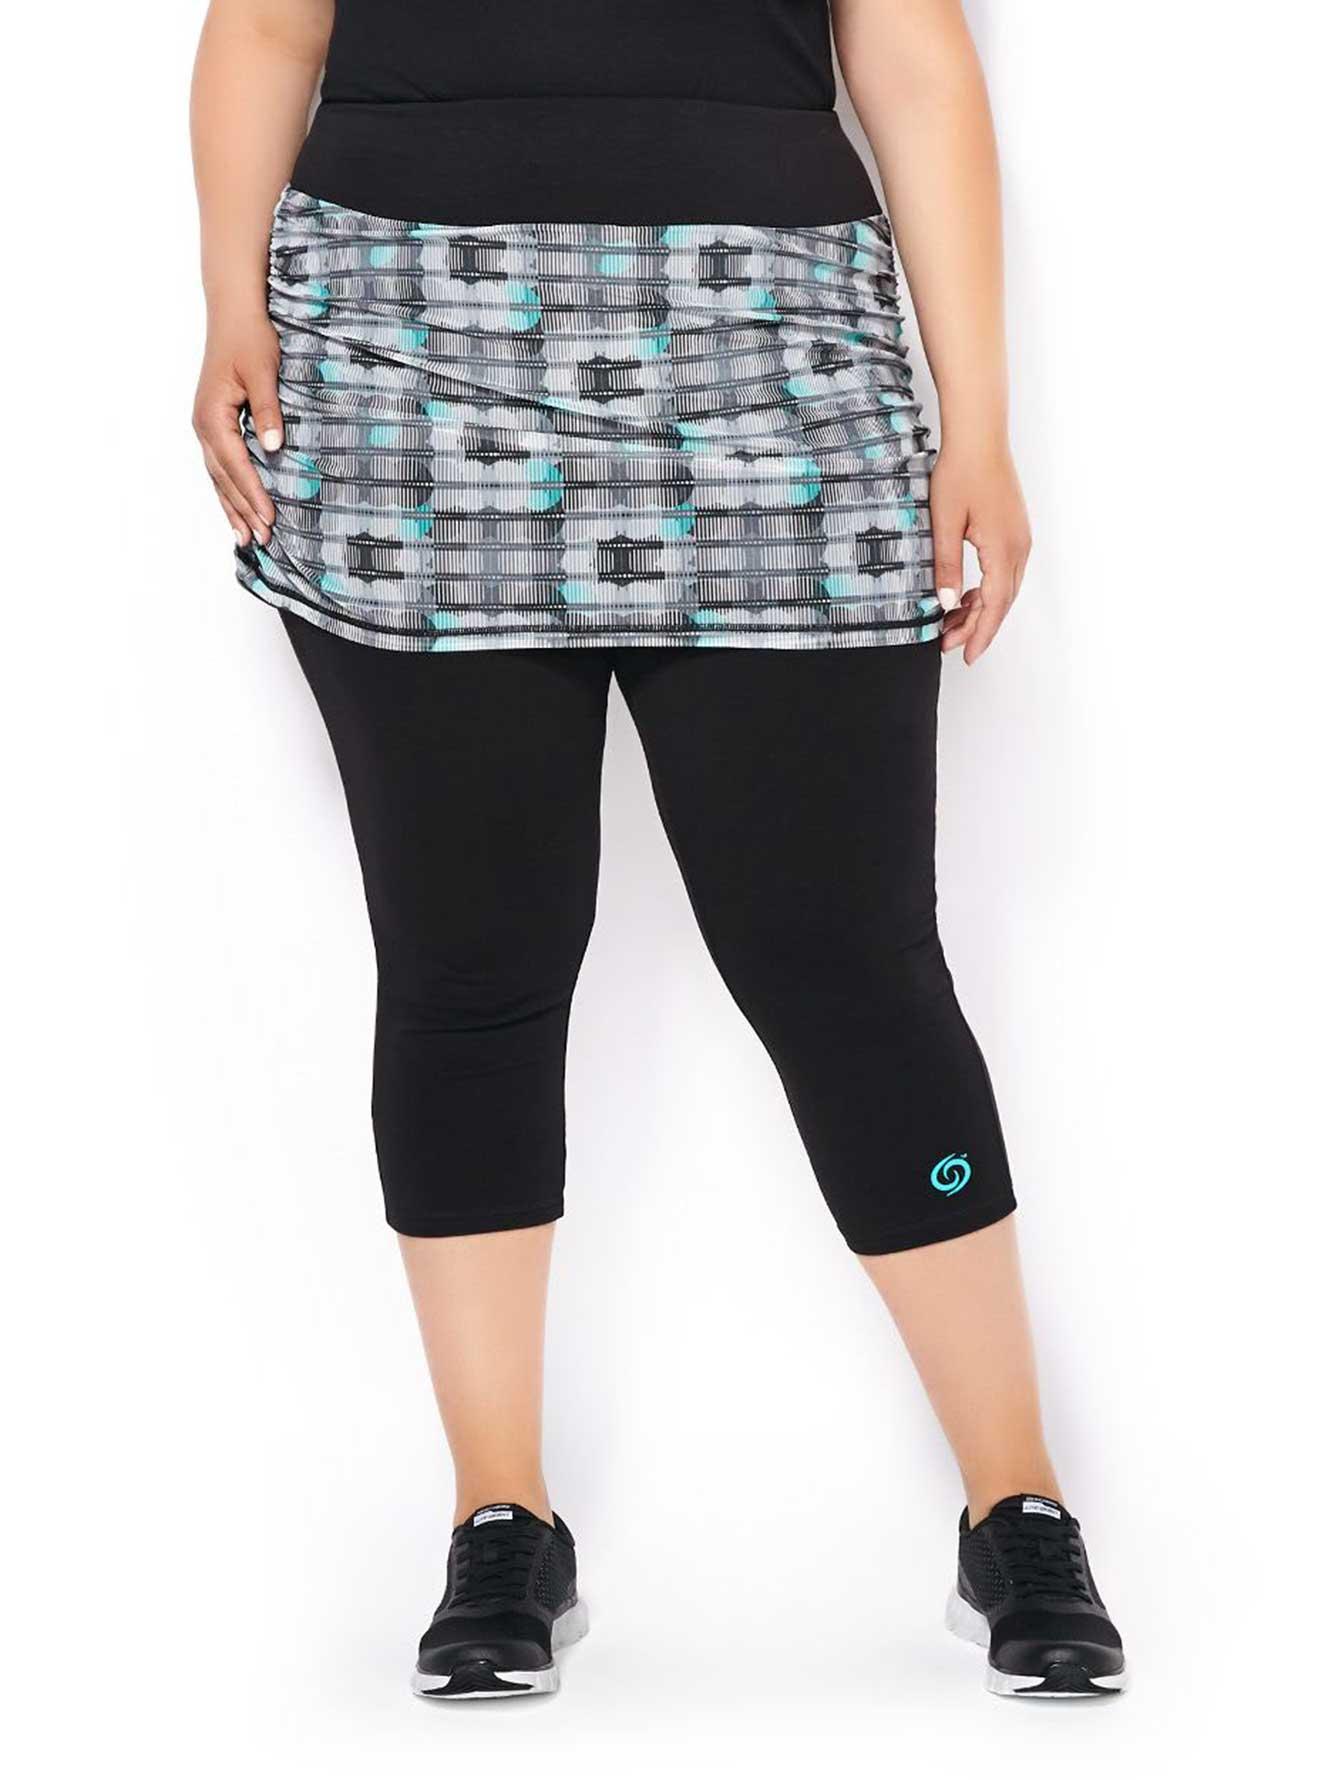 activezone plus-size capri legging with mesh skirt | penningtons